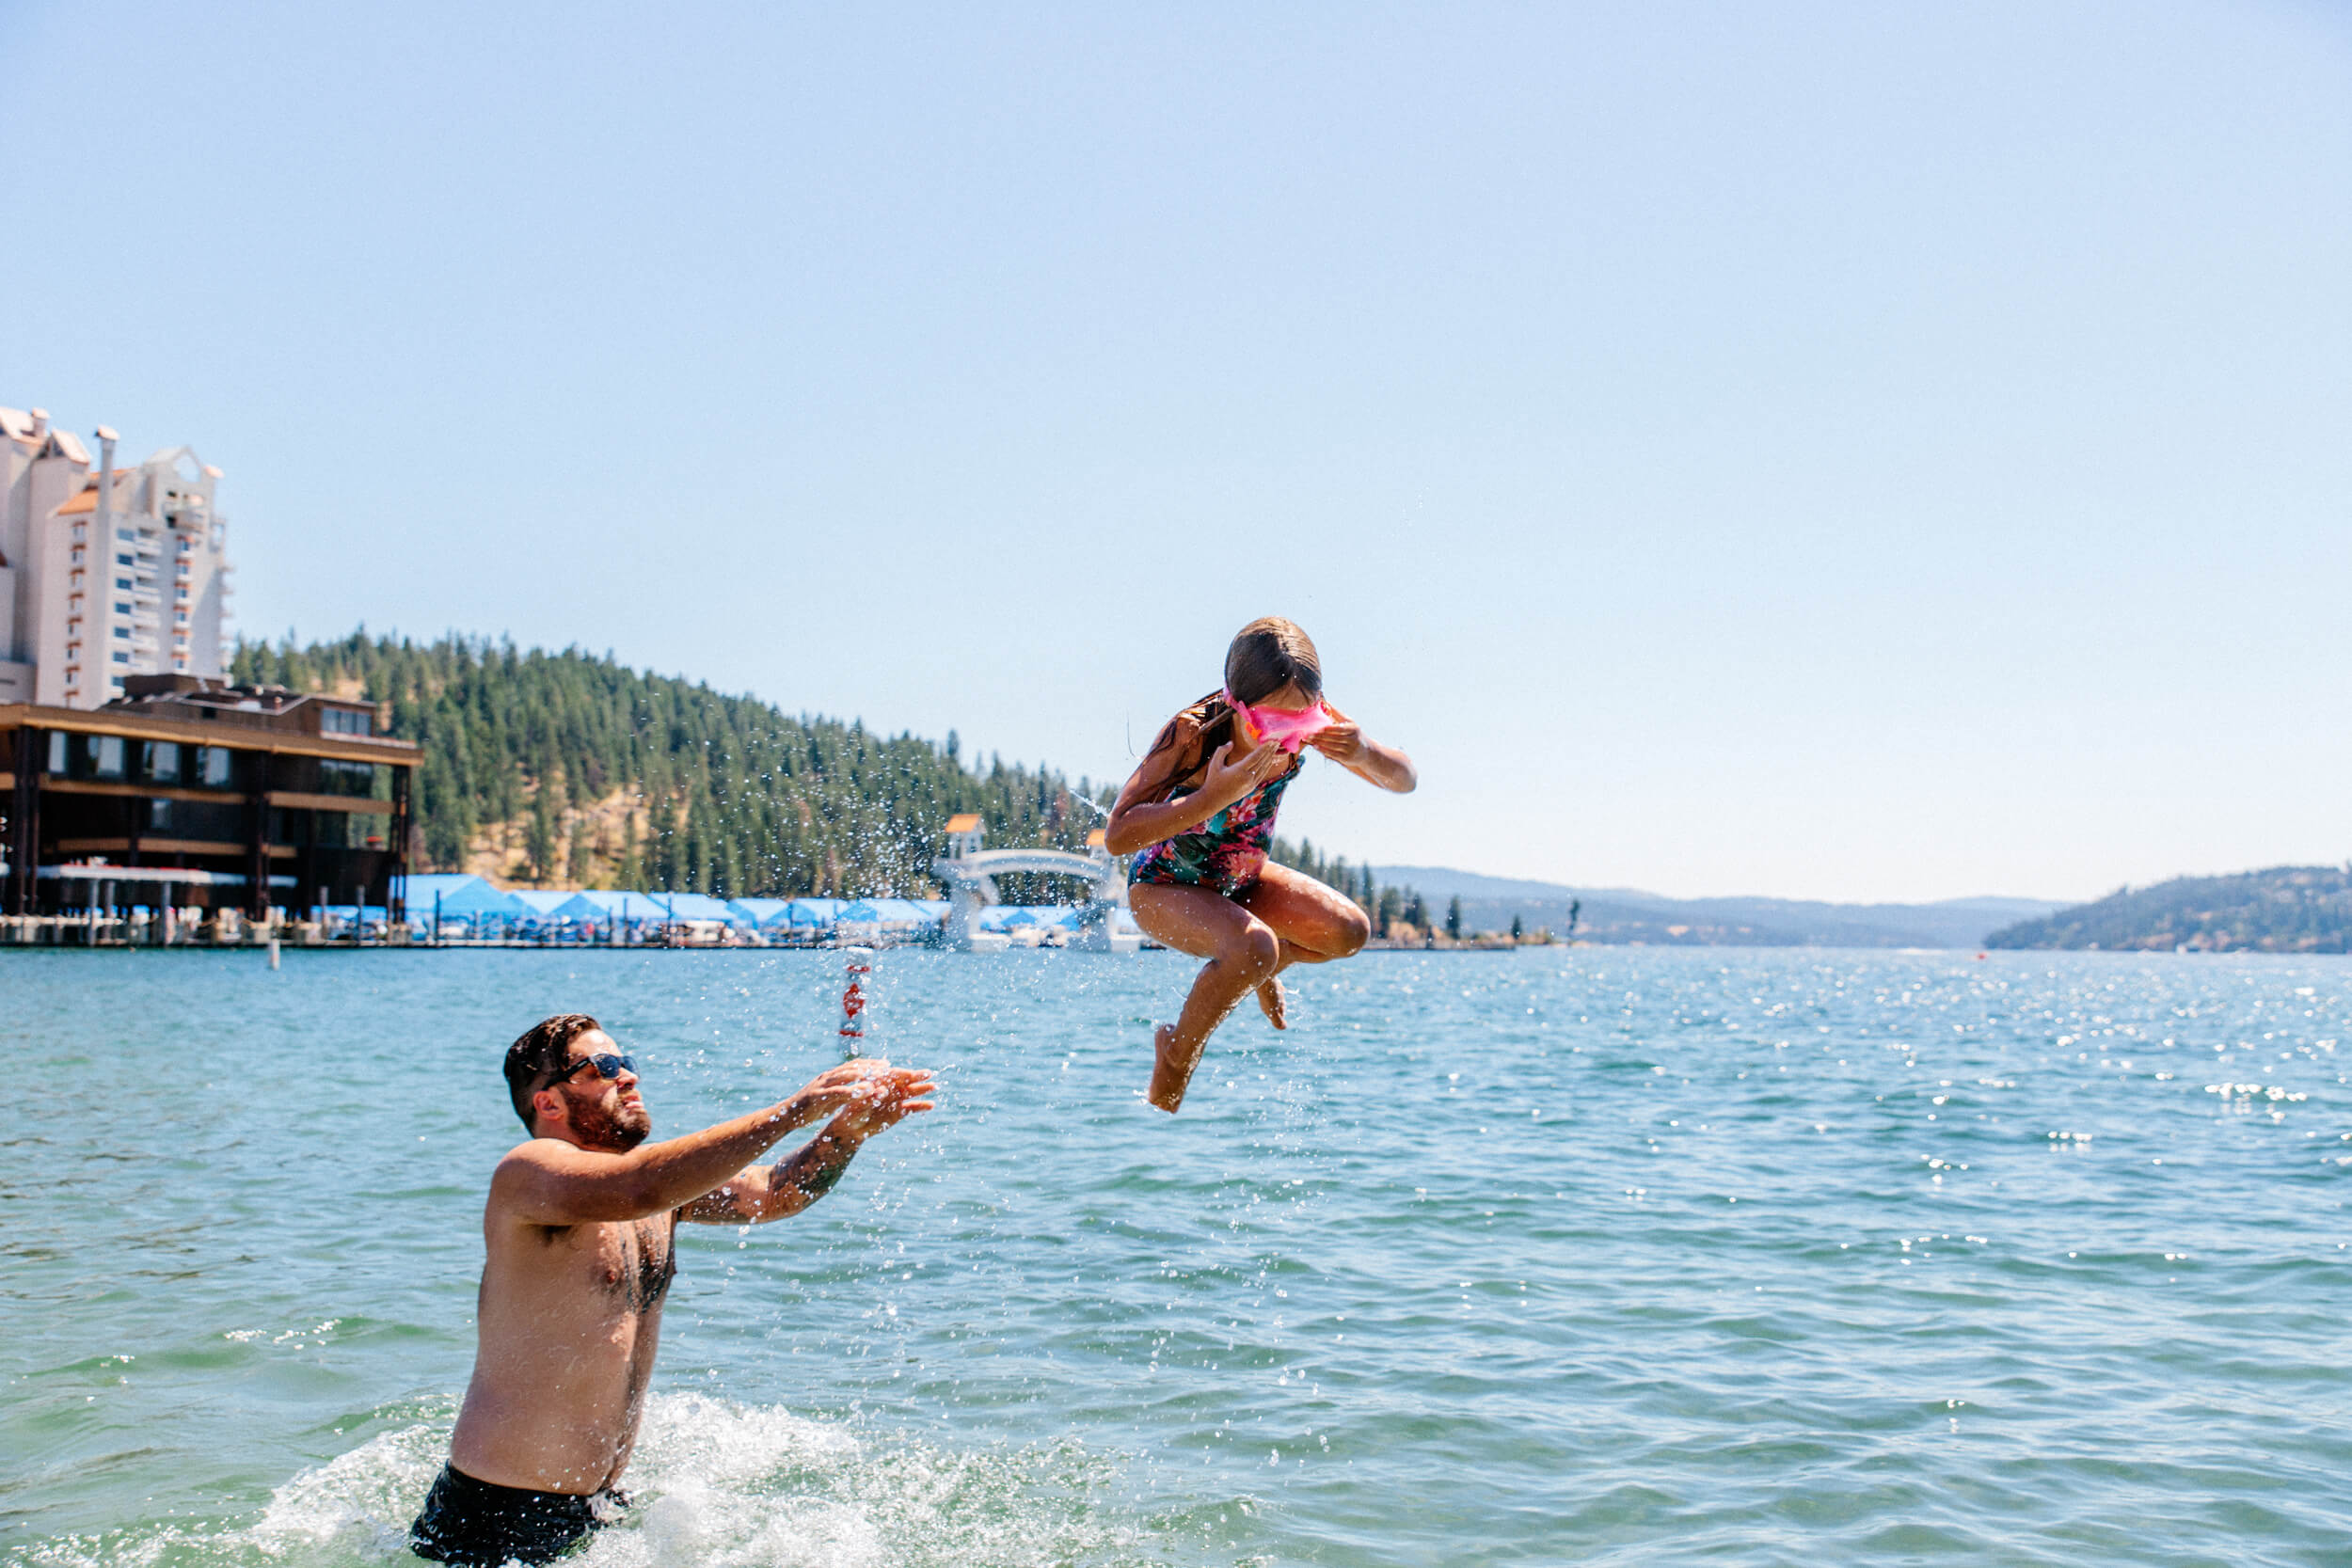 Lake Coeur d'Alene, Coeur d'Alene. Photo Credit: Idaho Tourism